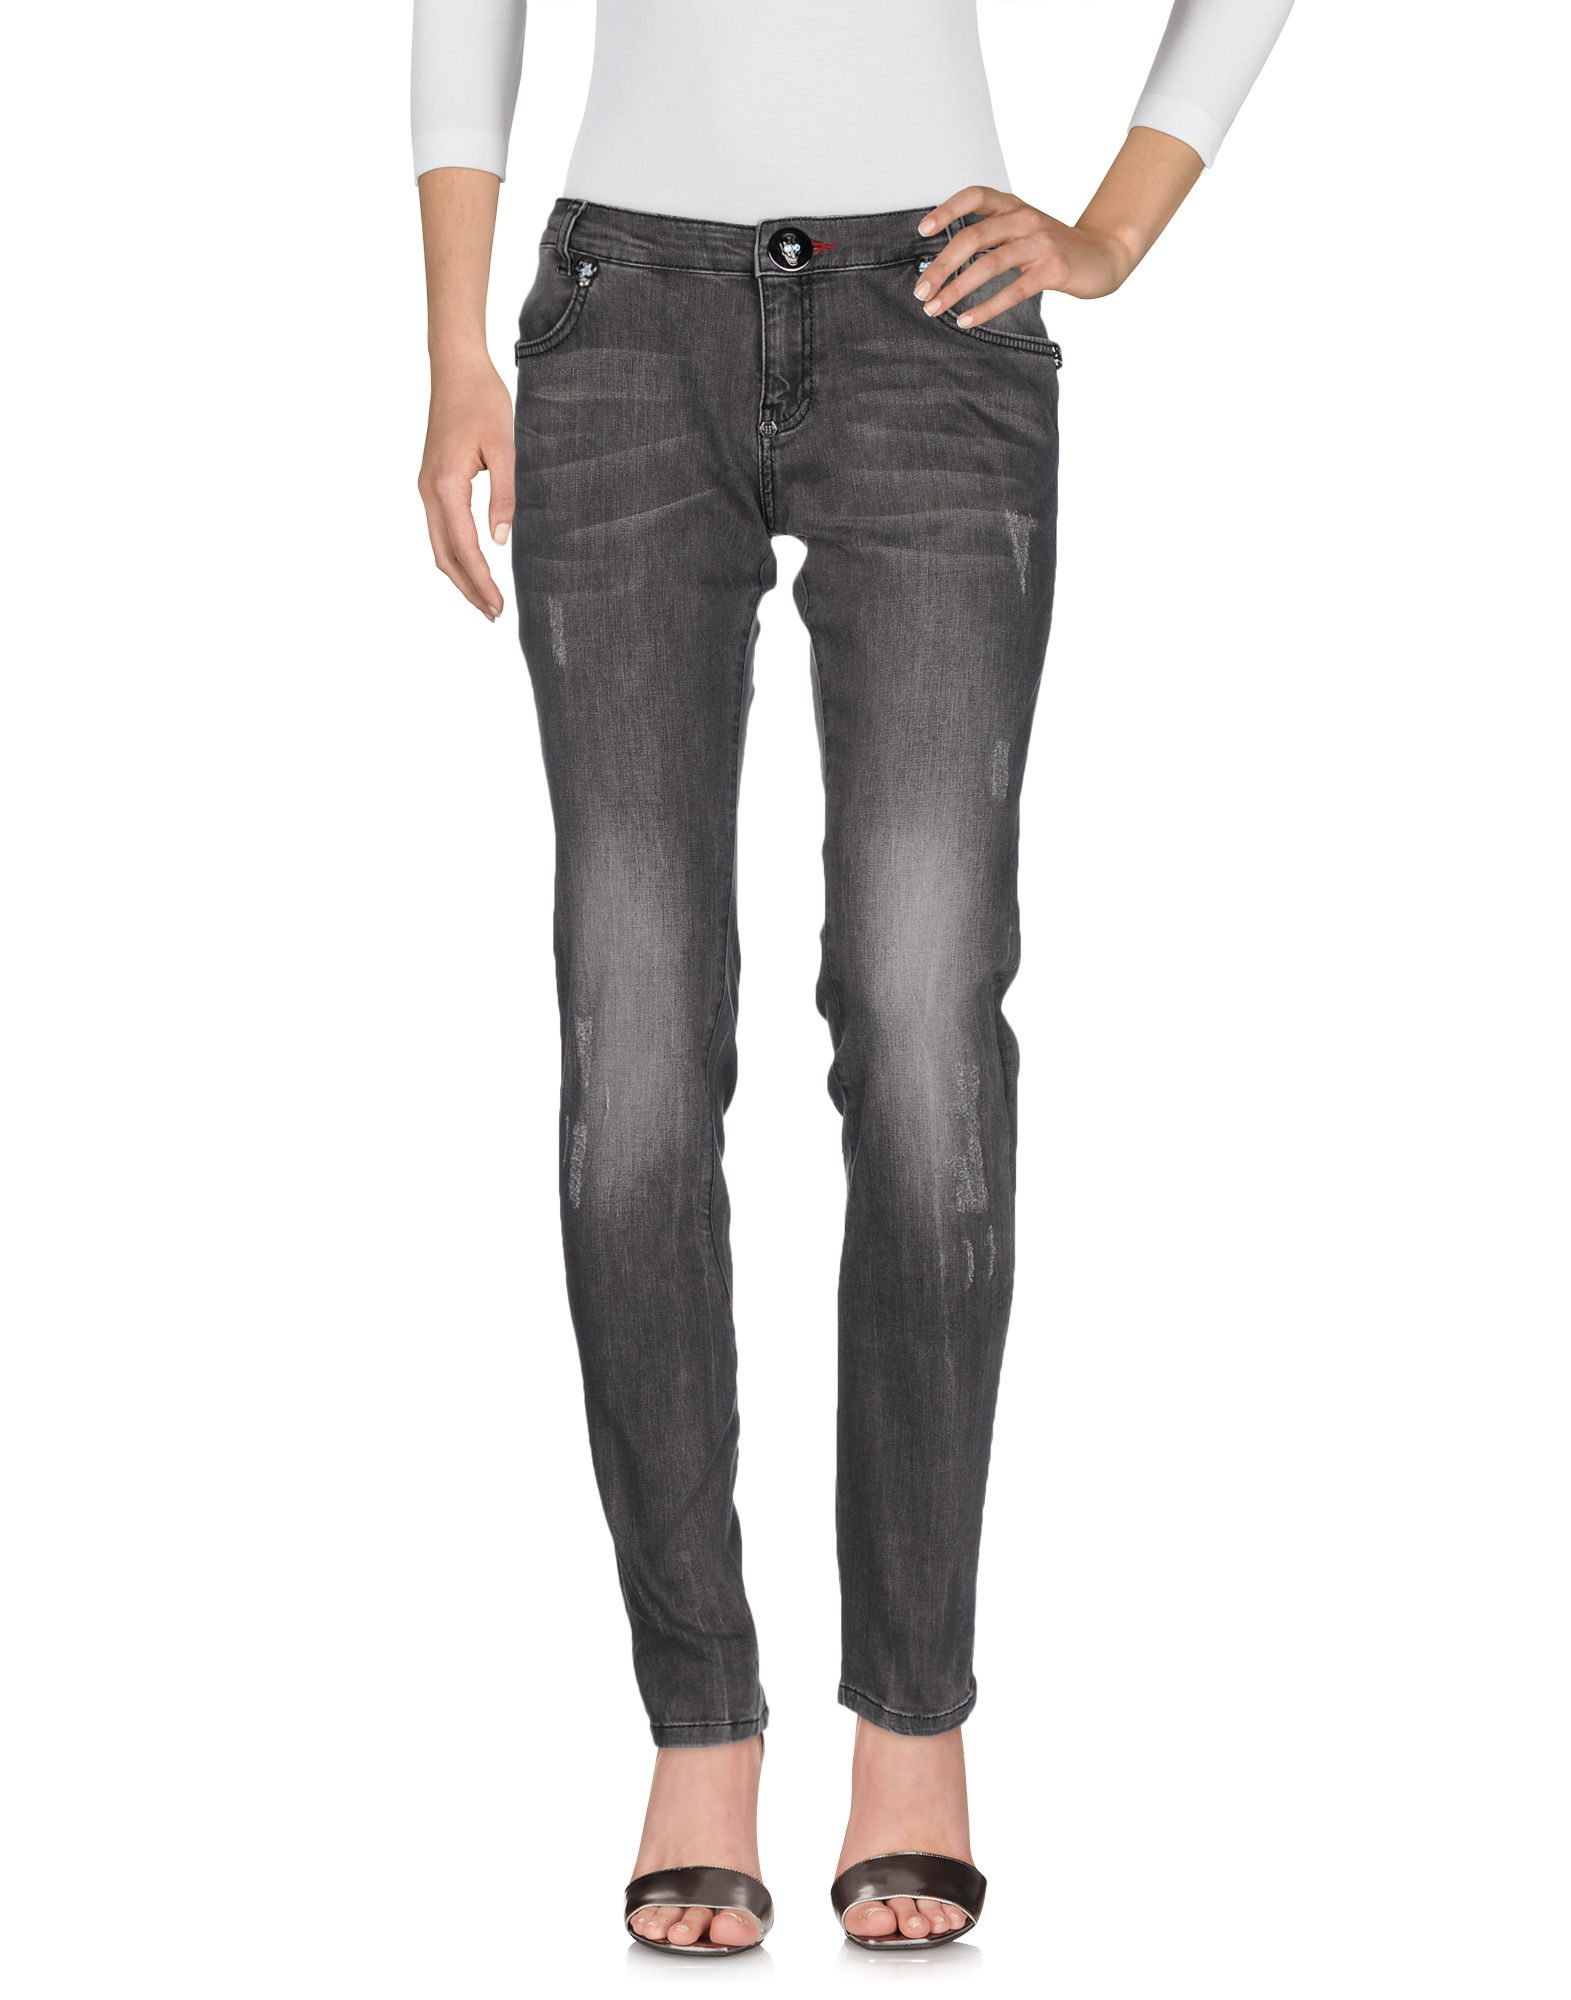 Pantaloni Jeans Philipp Plein Donna - Acquista online su UsybK5